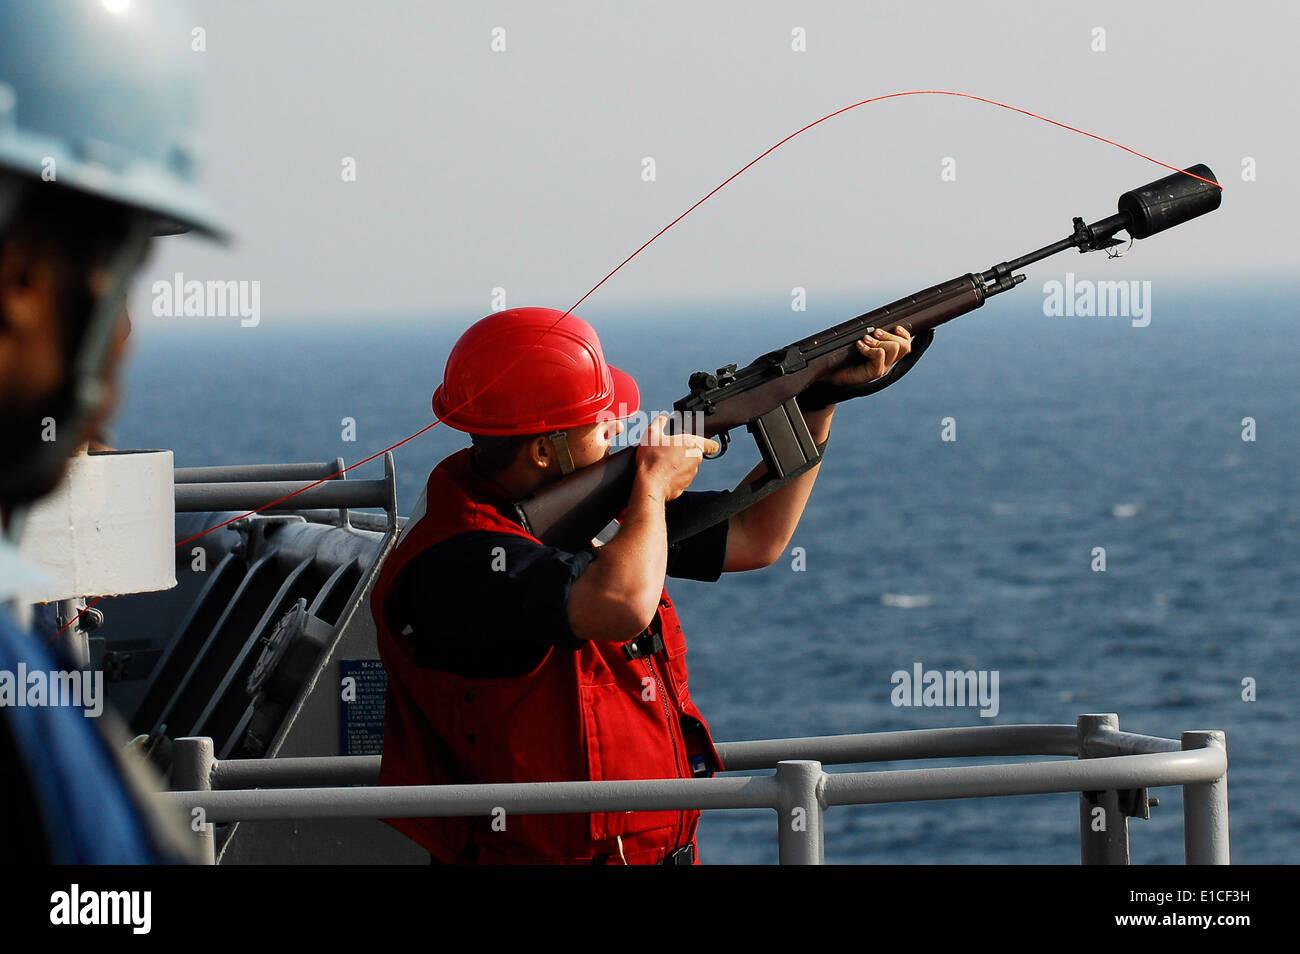 U.S. Navy Gunner's Mate 3rd Class Joshua A. Spooner prepares to ...